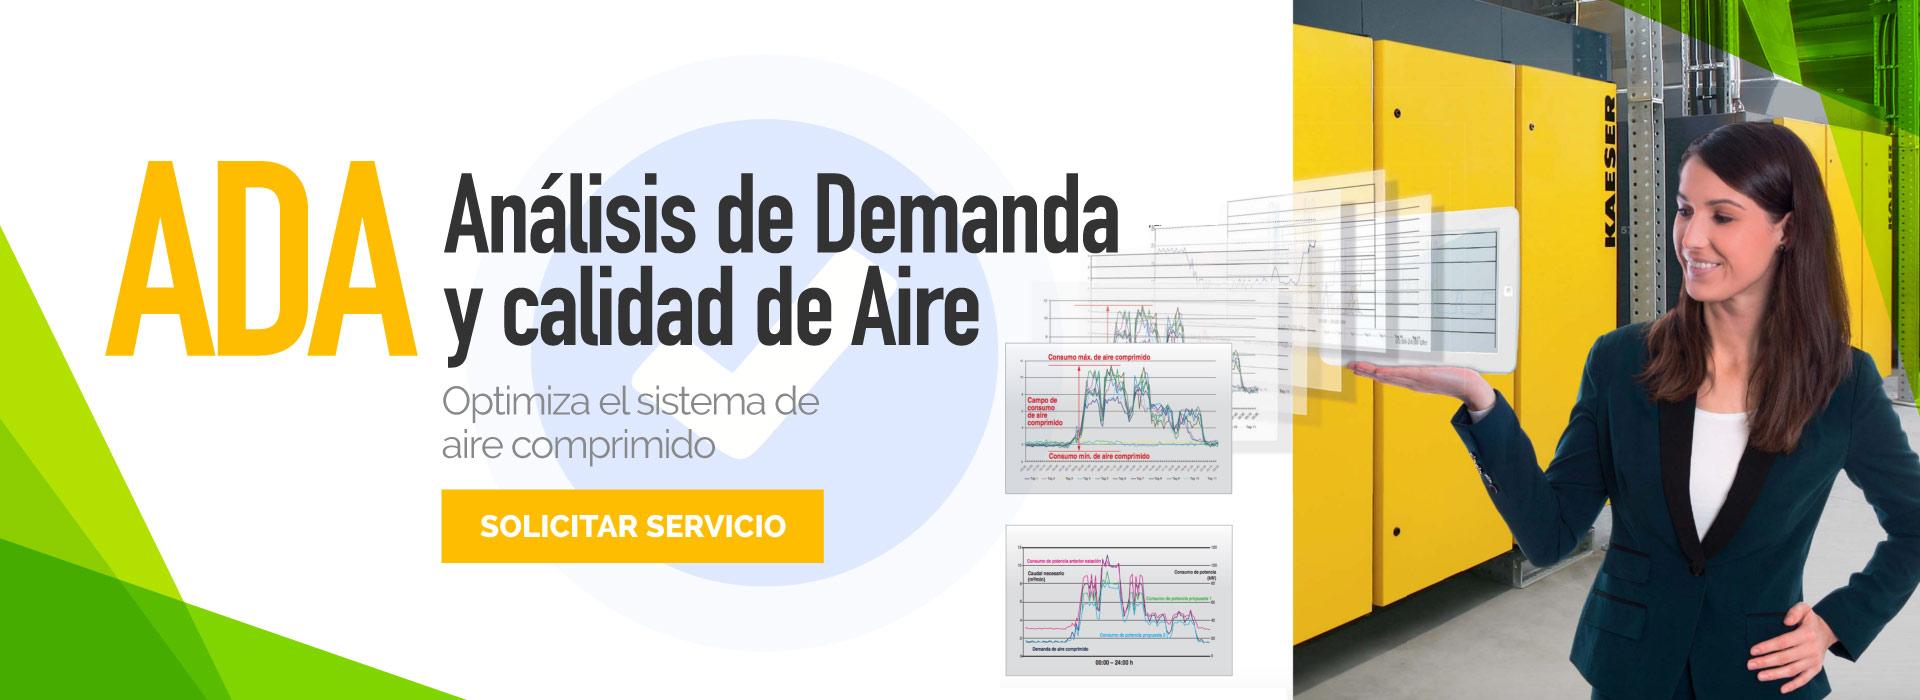 banner-ADA-yunfer-analisis-demanda-aire-comprimido-kaeser-solucion-eficacia-energia